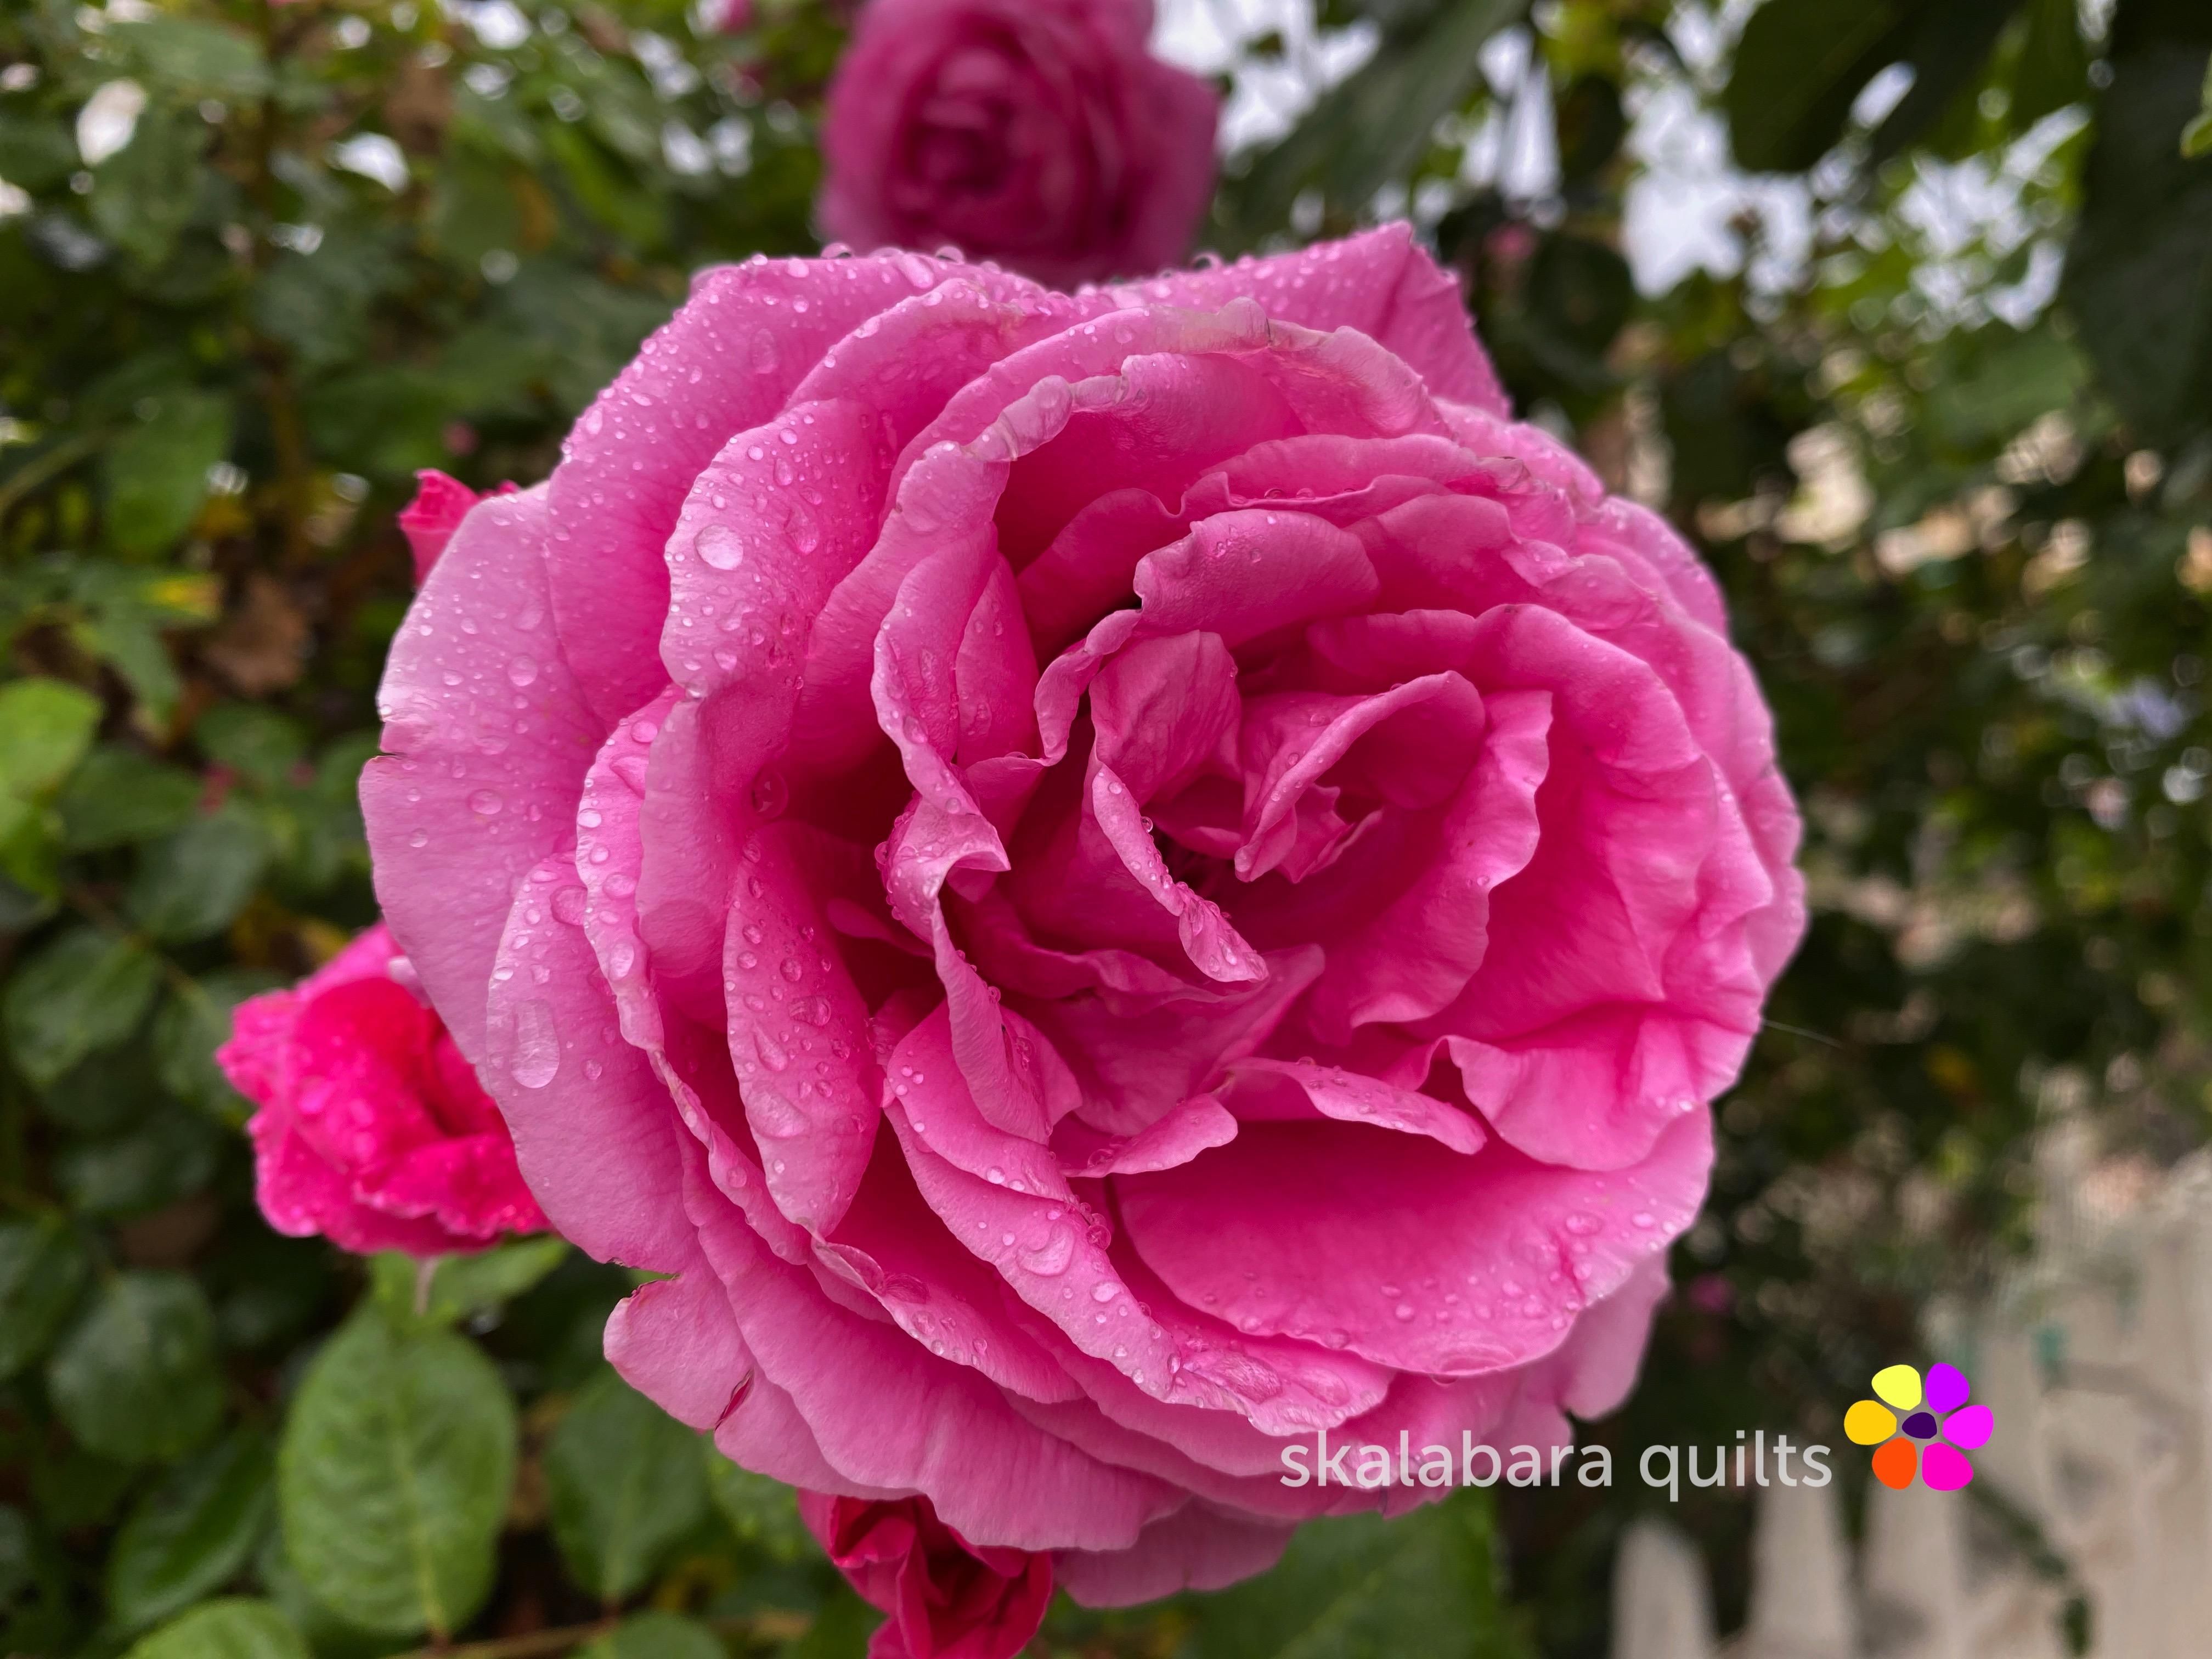 old englisch rose flower close-up